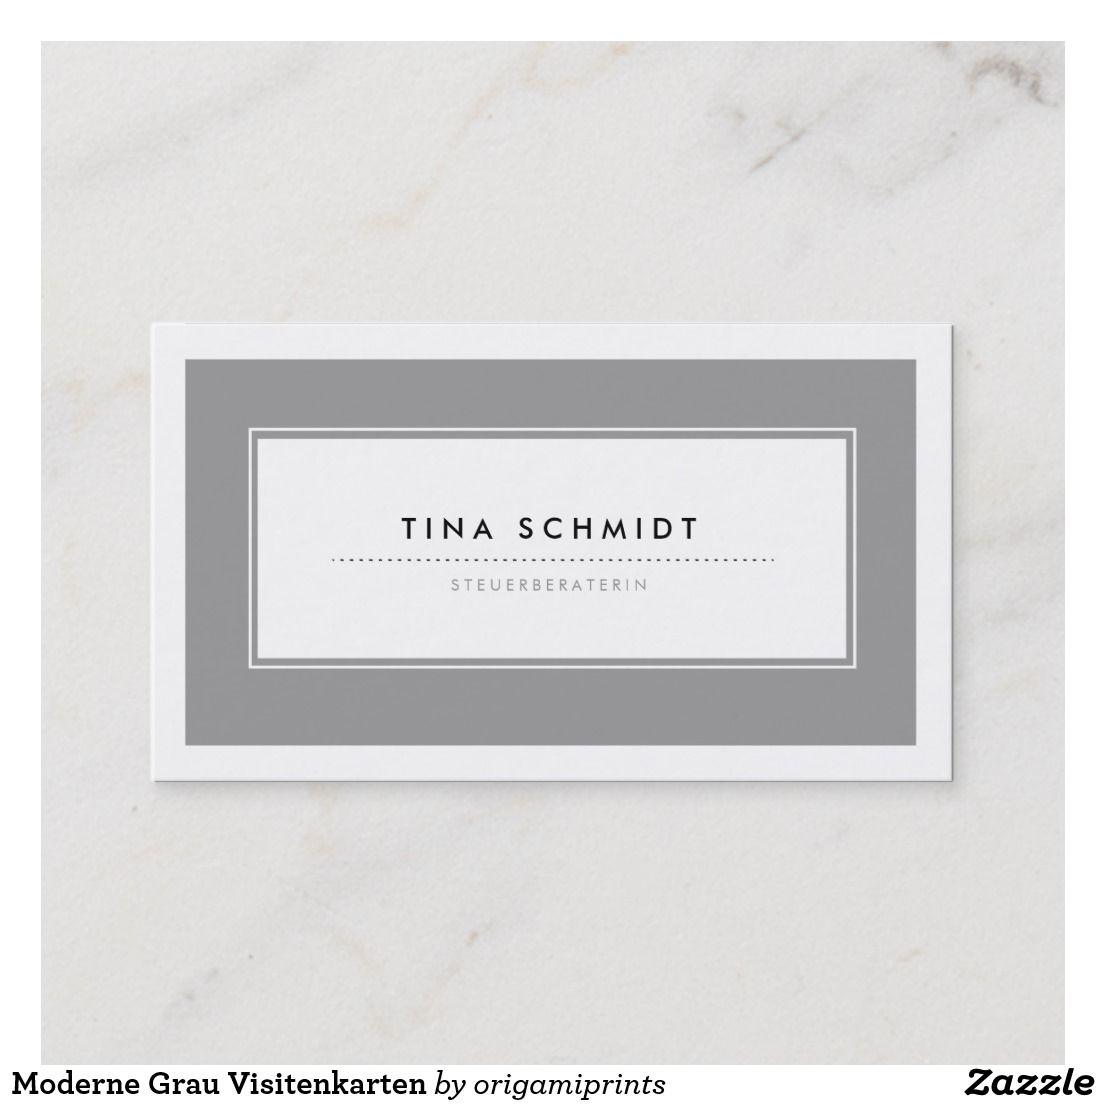 Moderne Grau Visitenkarten Business Card Zazzle Com